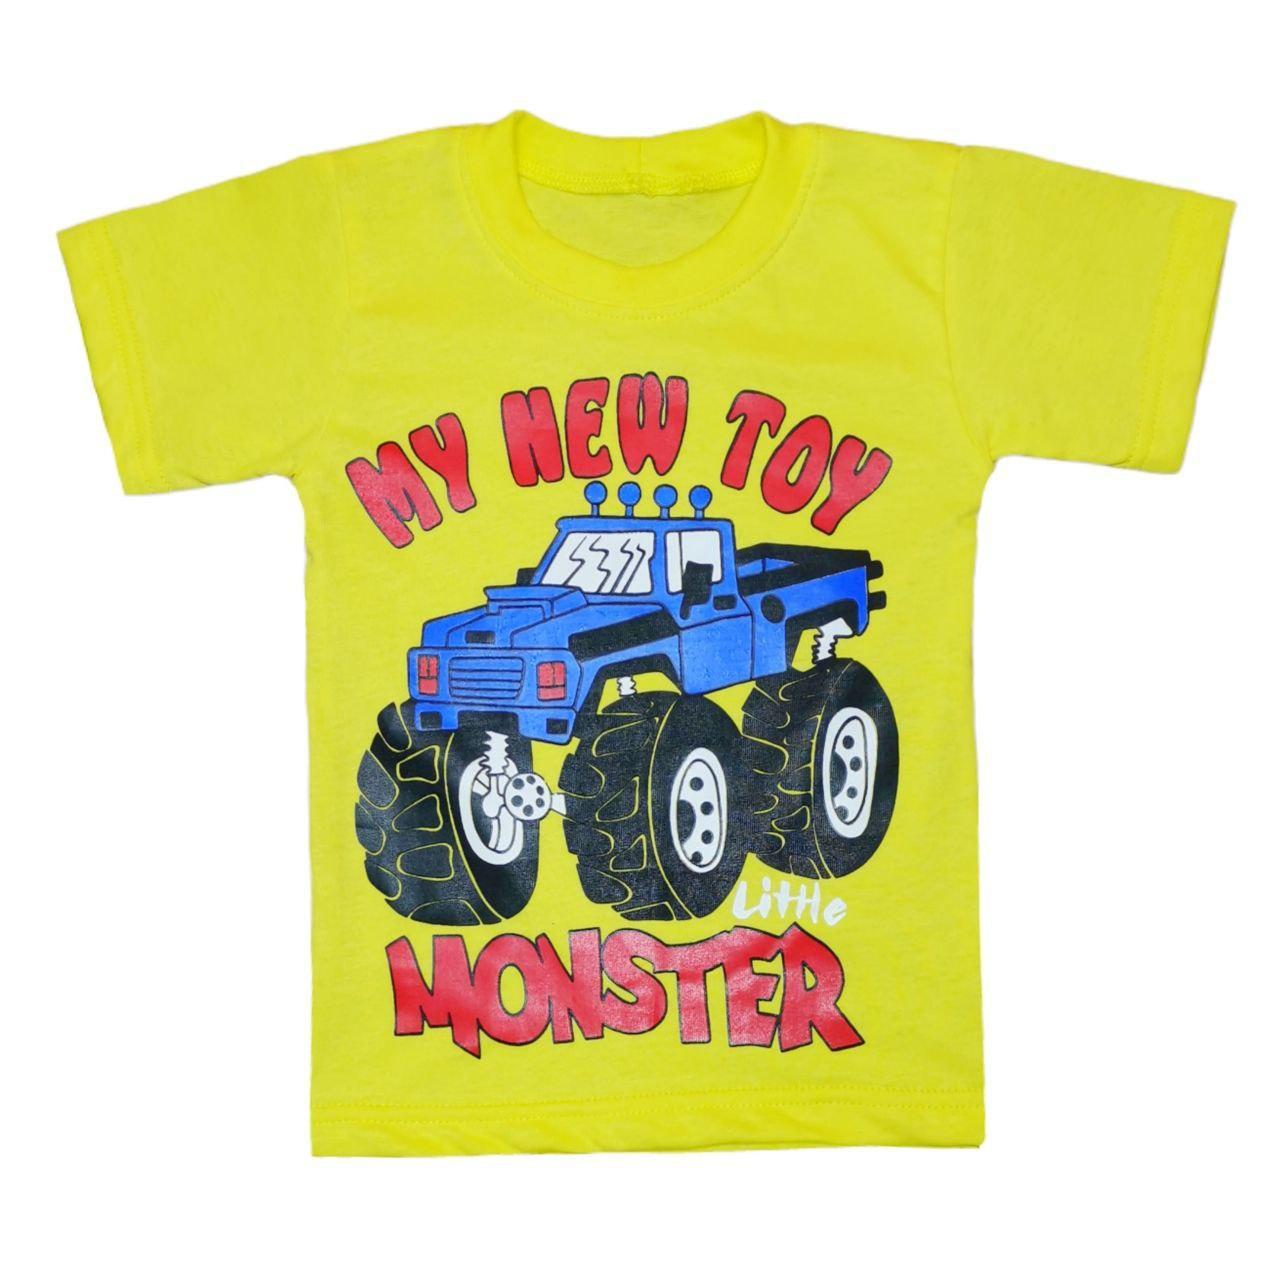 Футболка для мальчика с принтом My New Toy Monster кулир